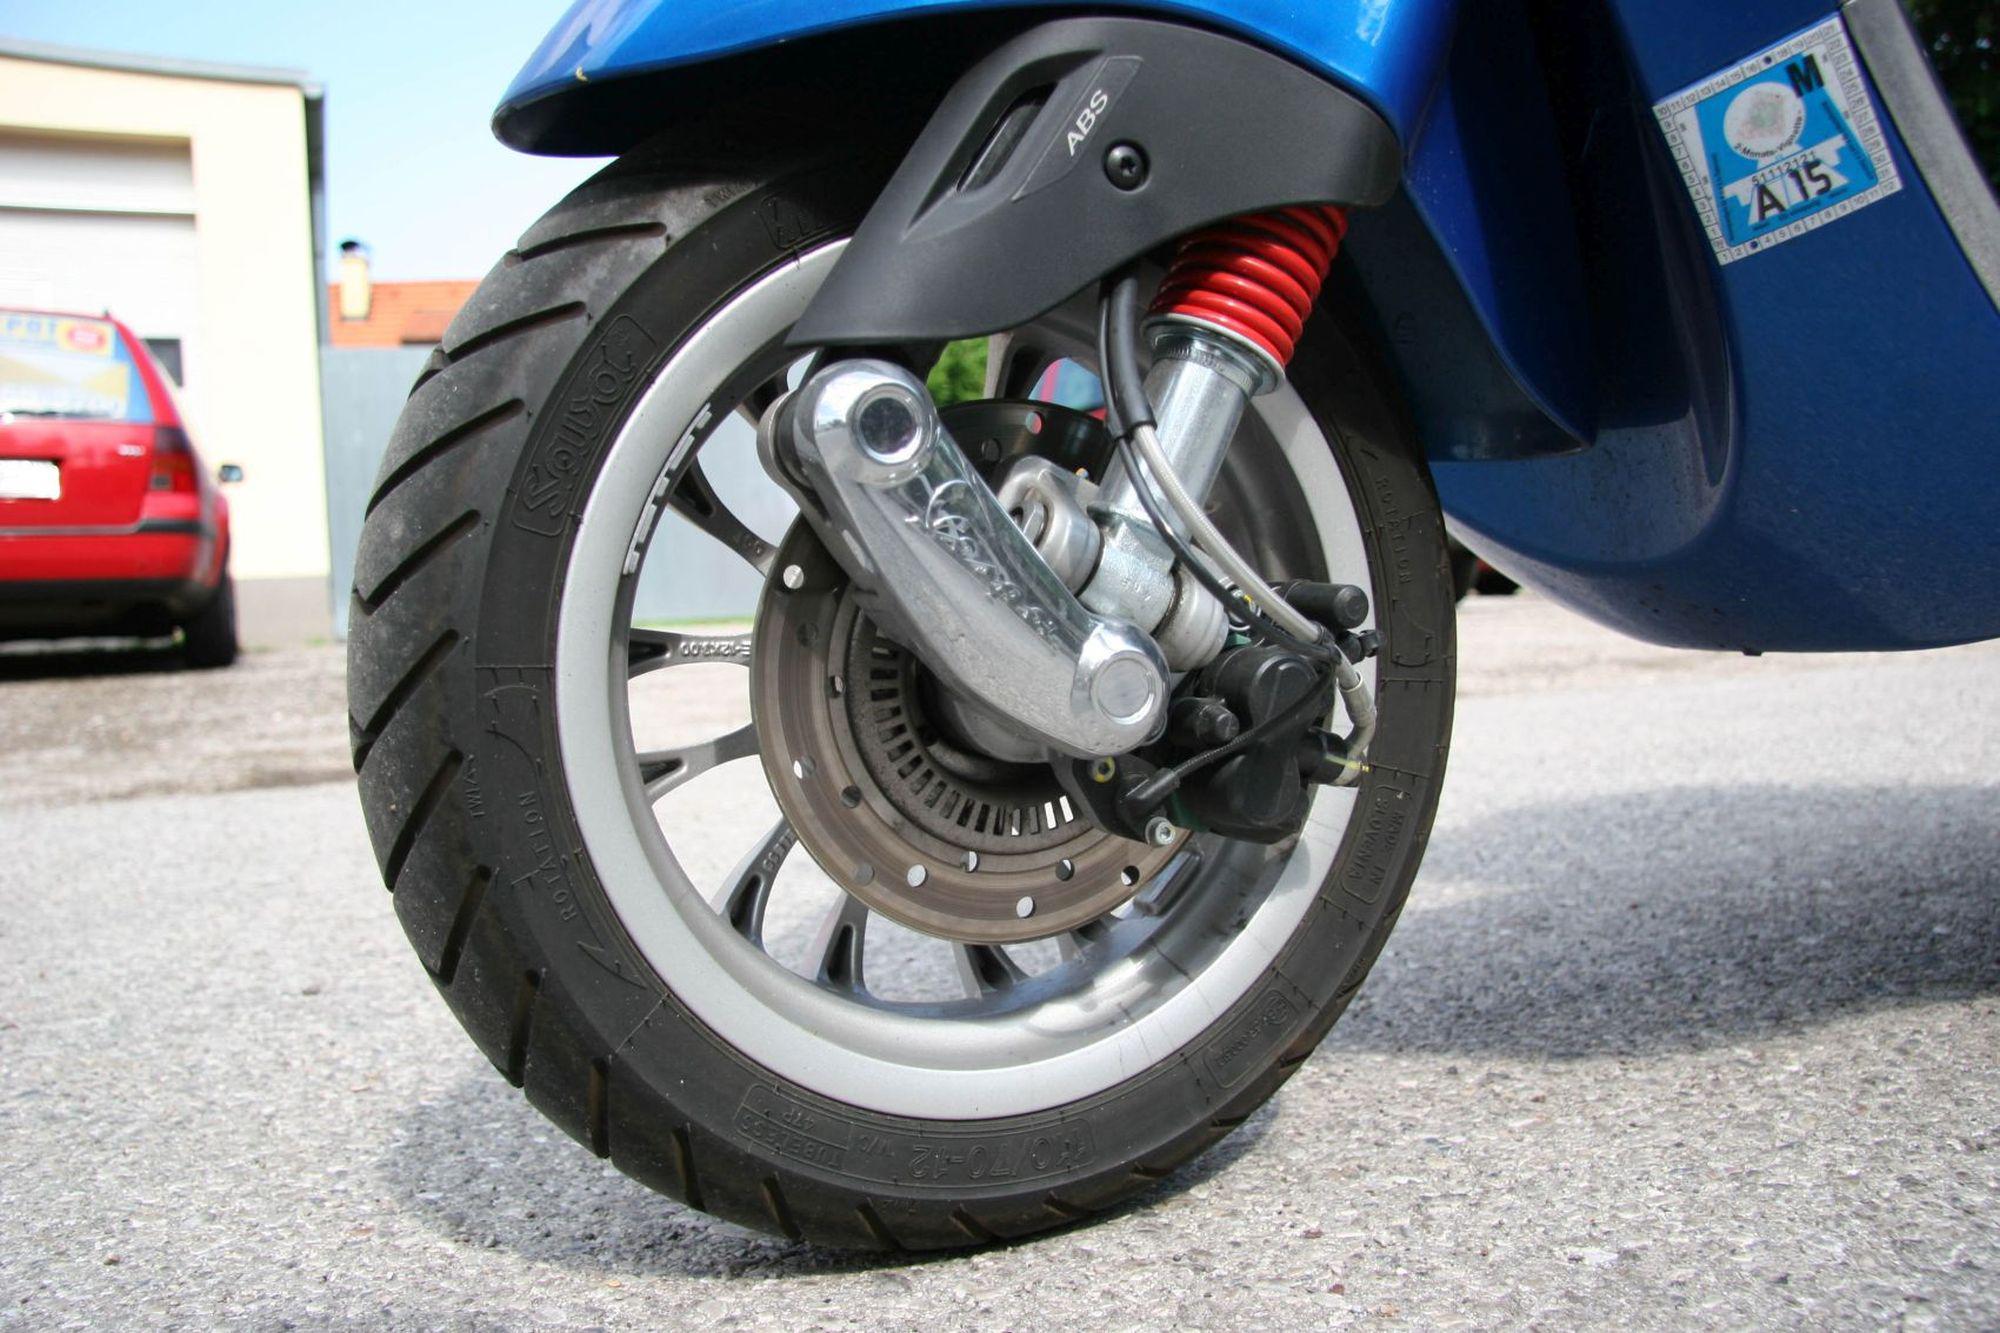 Honda Sh125i Praktischer Großradroller 1000ps Test 2015 Testbericht